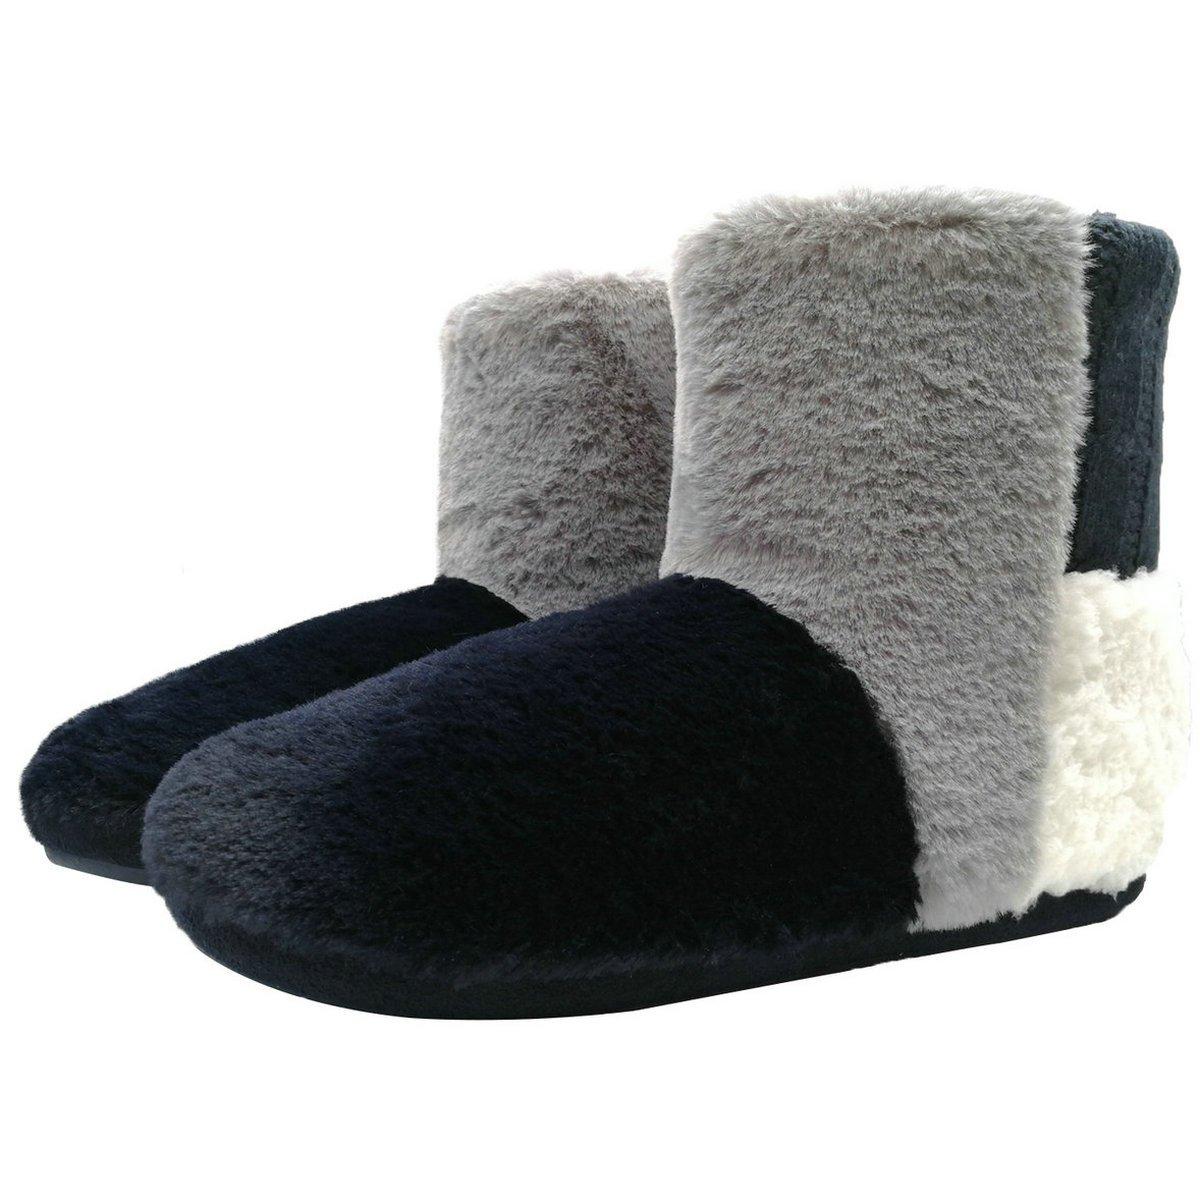 ONCAI Women's Elegant Indoor Slipper Boots (6.5-7 B(M), Navy)